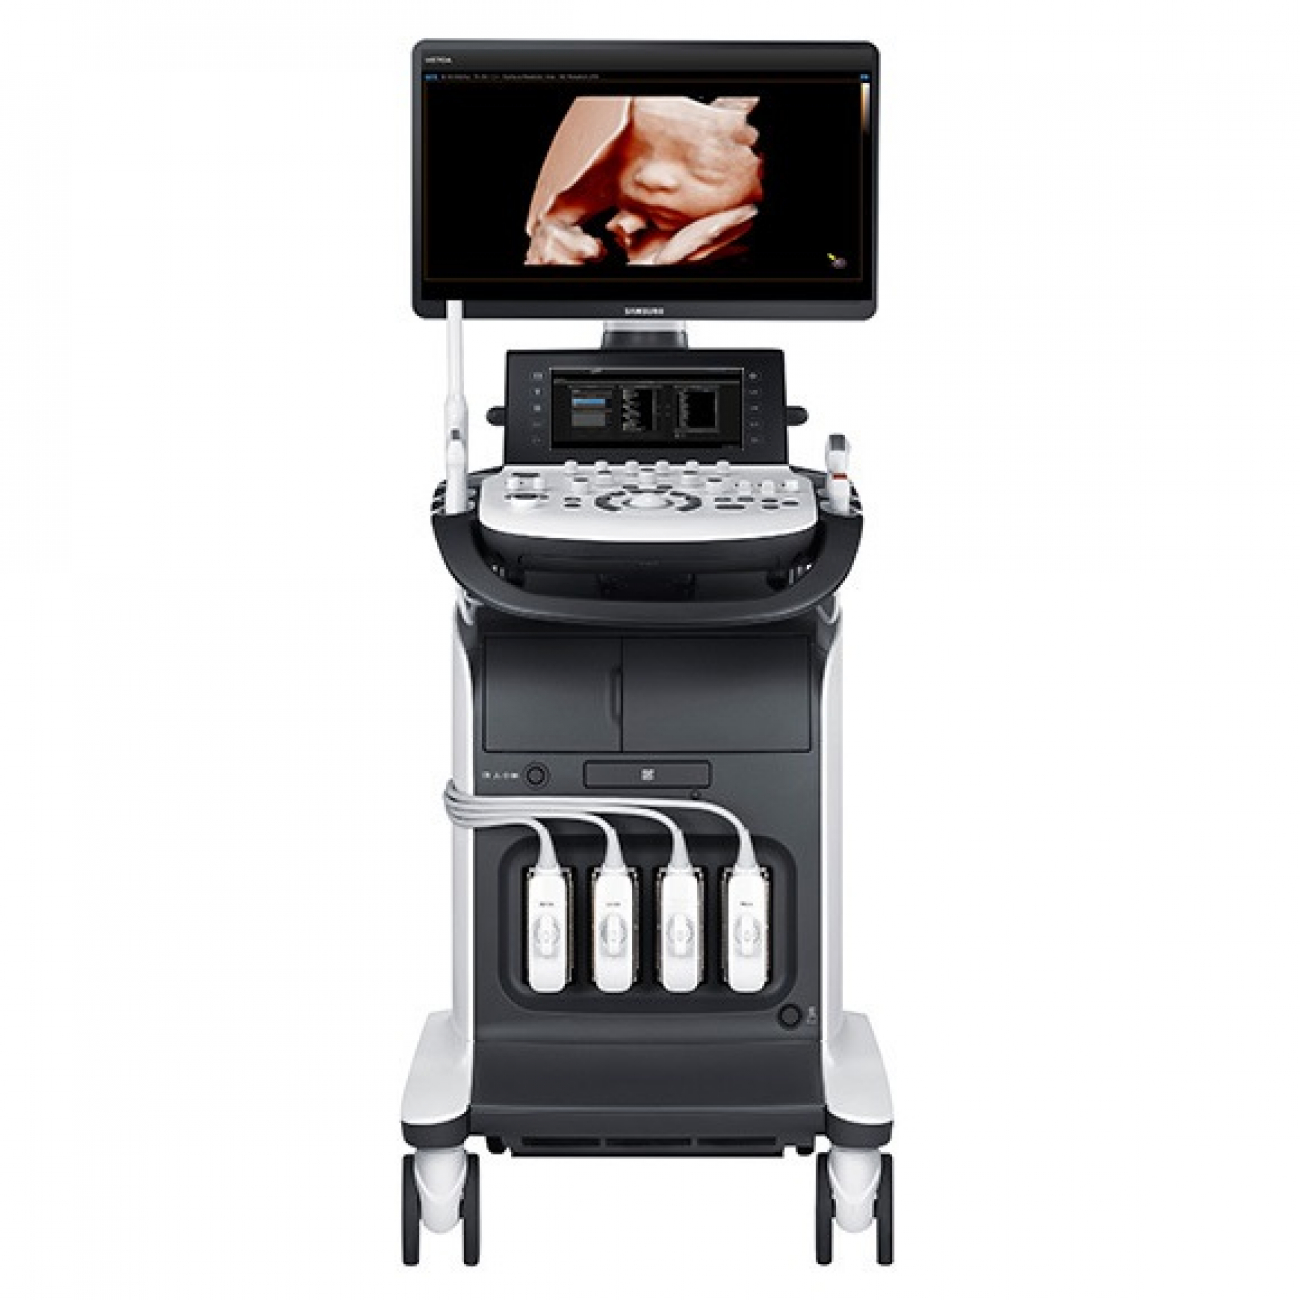 Samsung Medison HS70